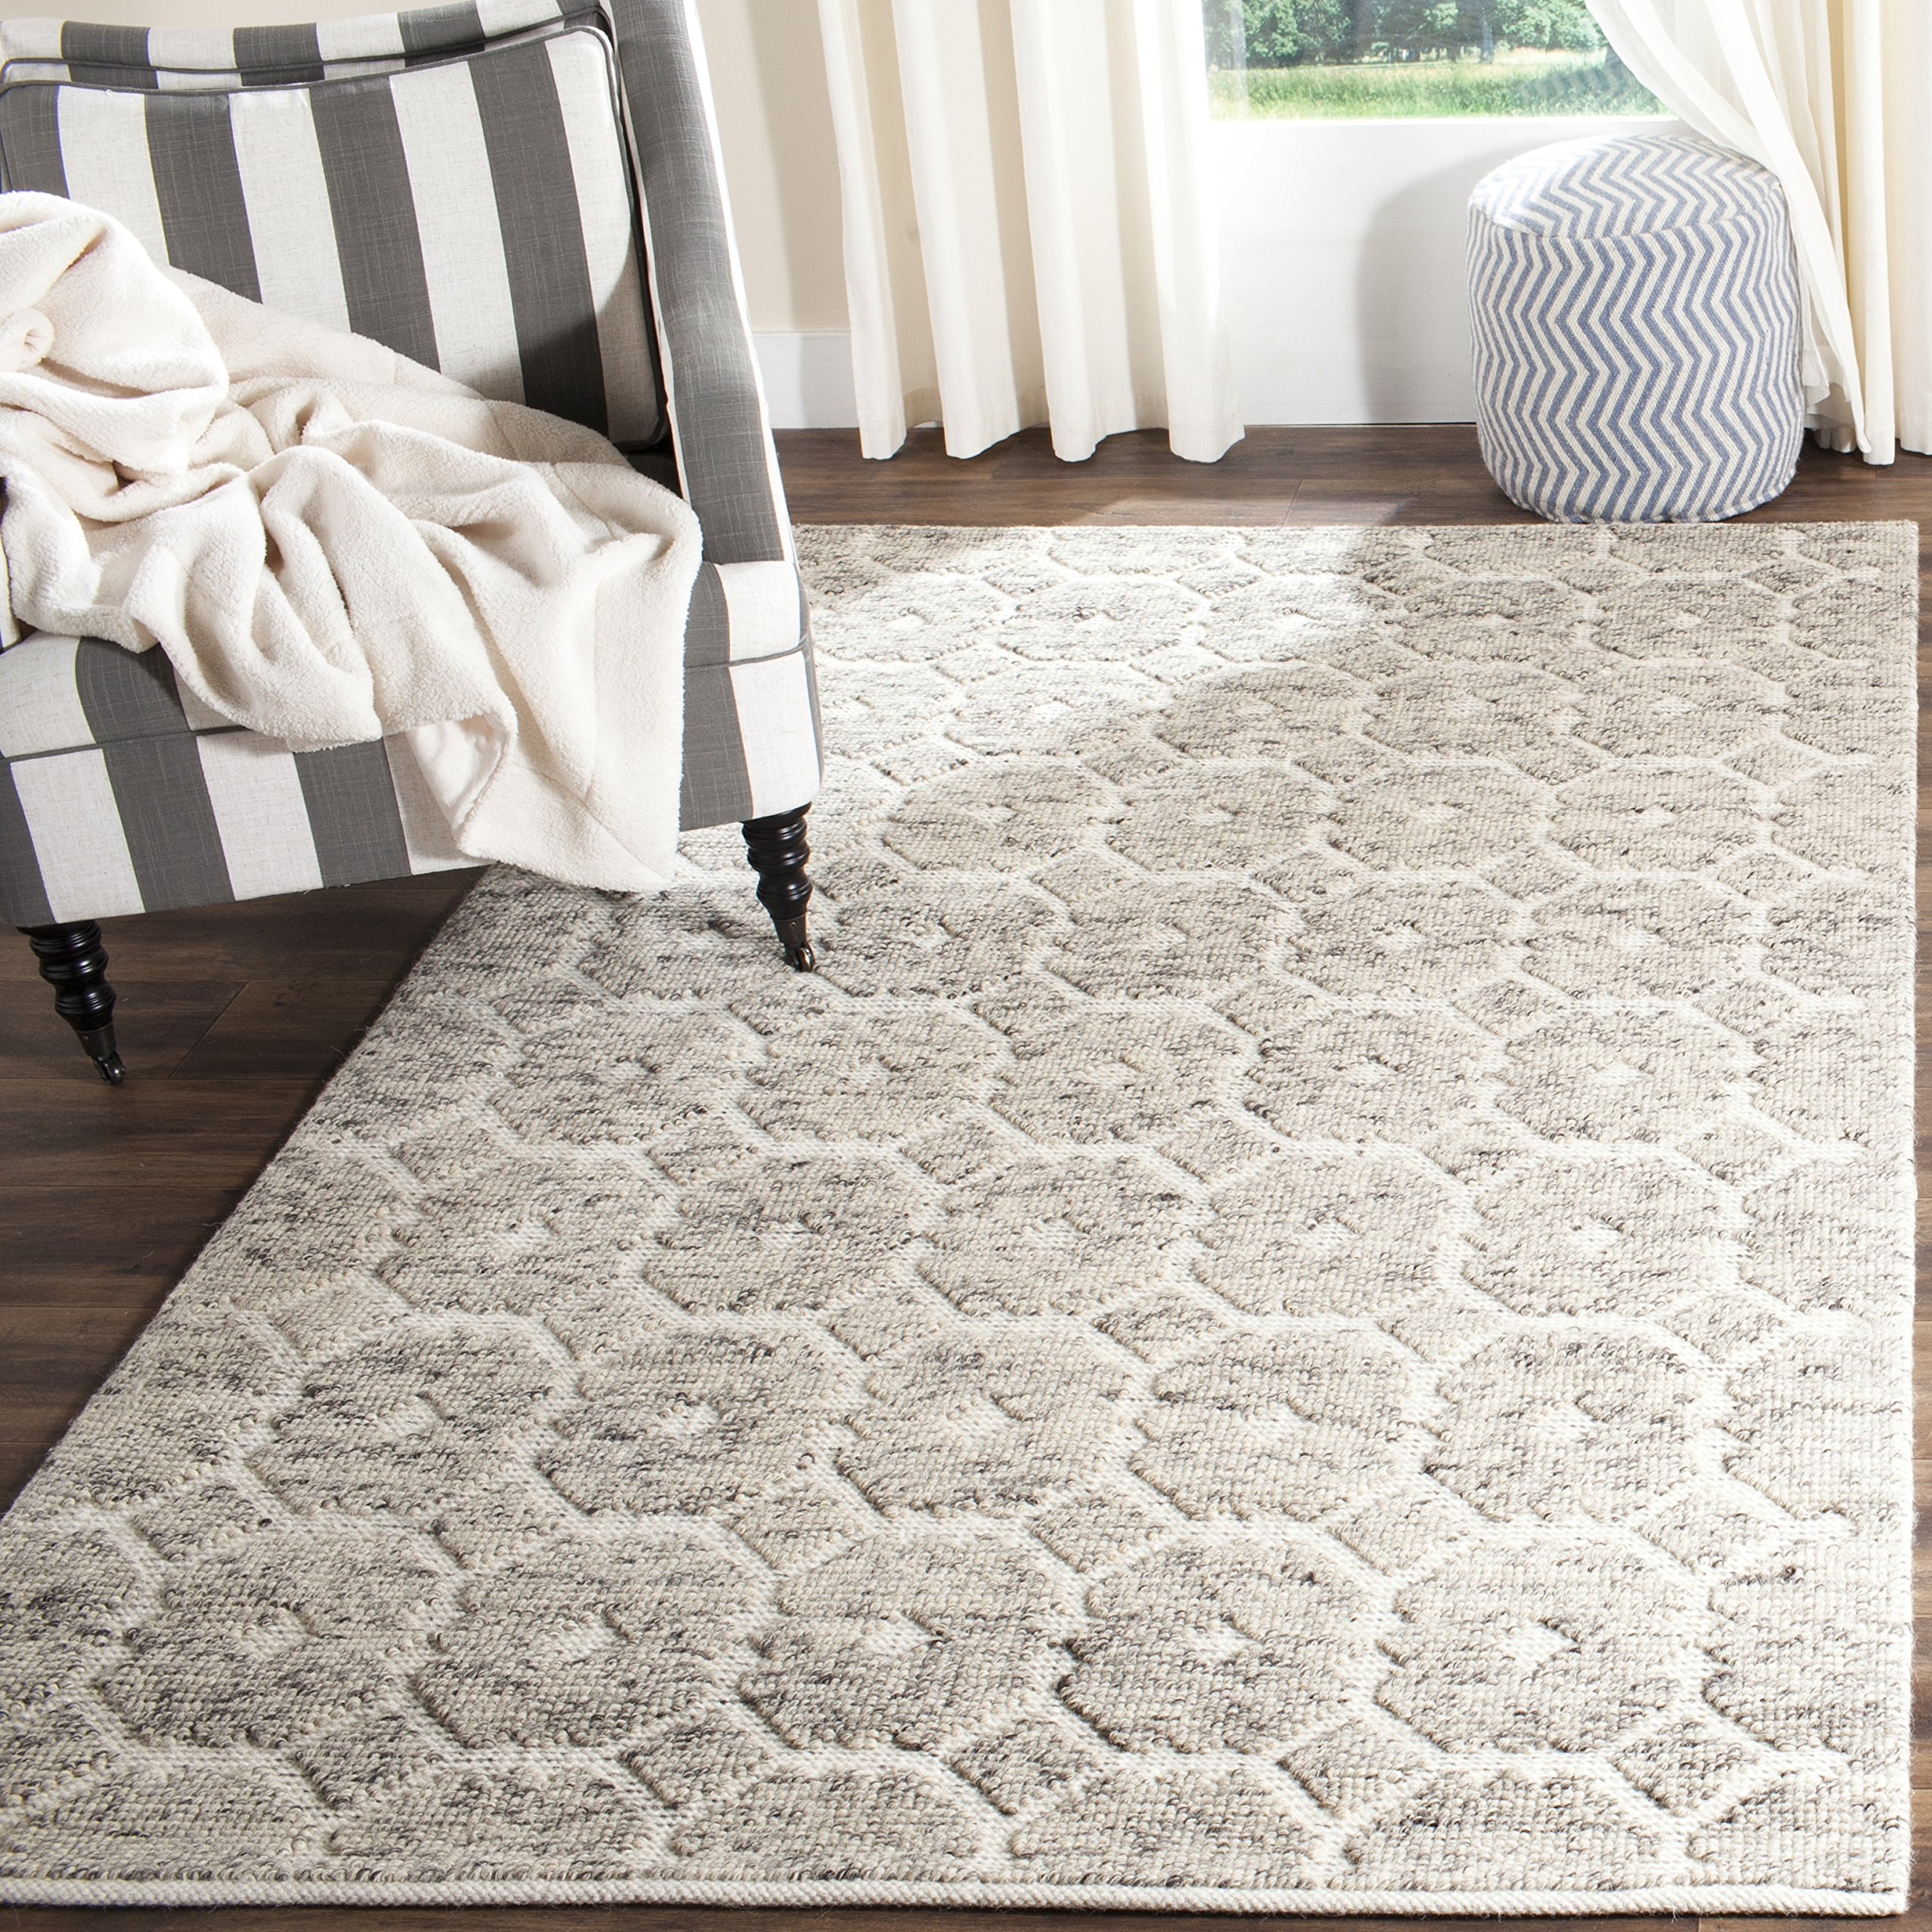 Amazon Com Safavieh Martha Stewart Collection Msr2560a Handmade Wool Area Rug 5 X 8 Grey Ivory Furniture Decor